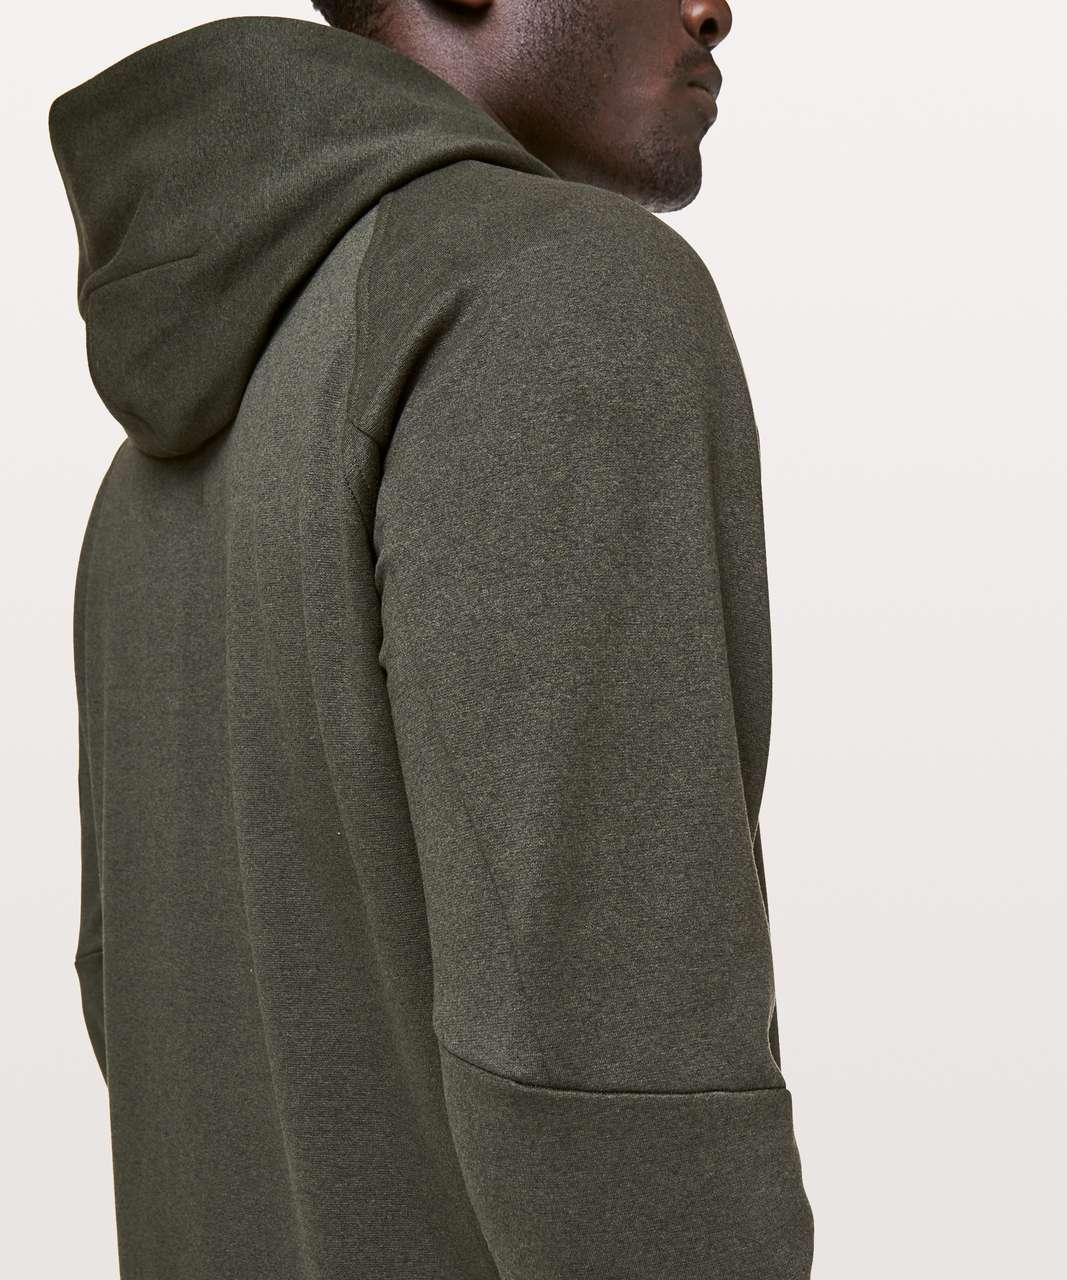 Lululemon City Sweat Pullover Hoodie *Thermo - Heathered Dark Olive